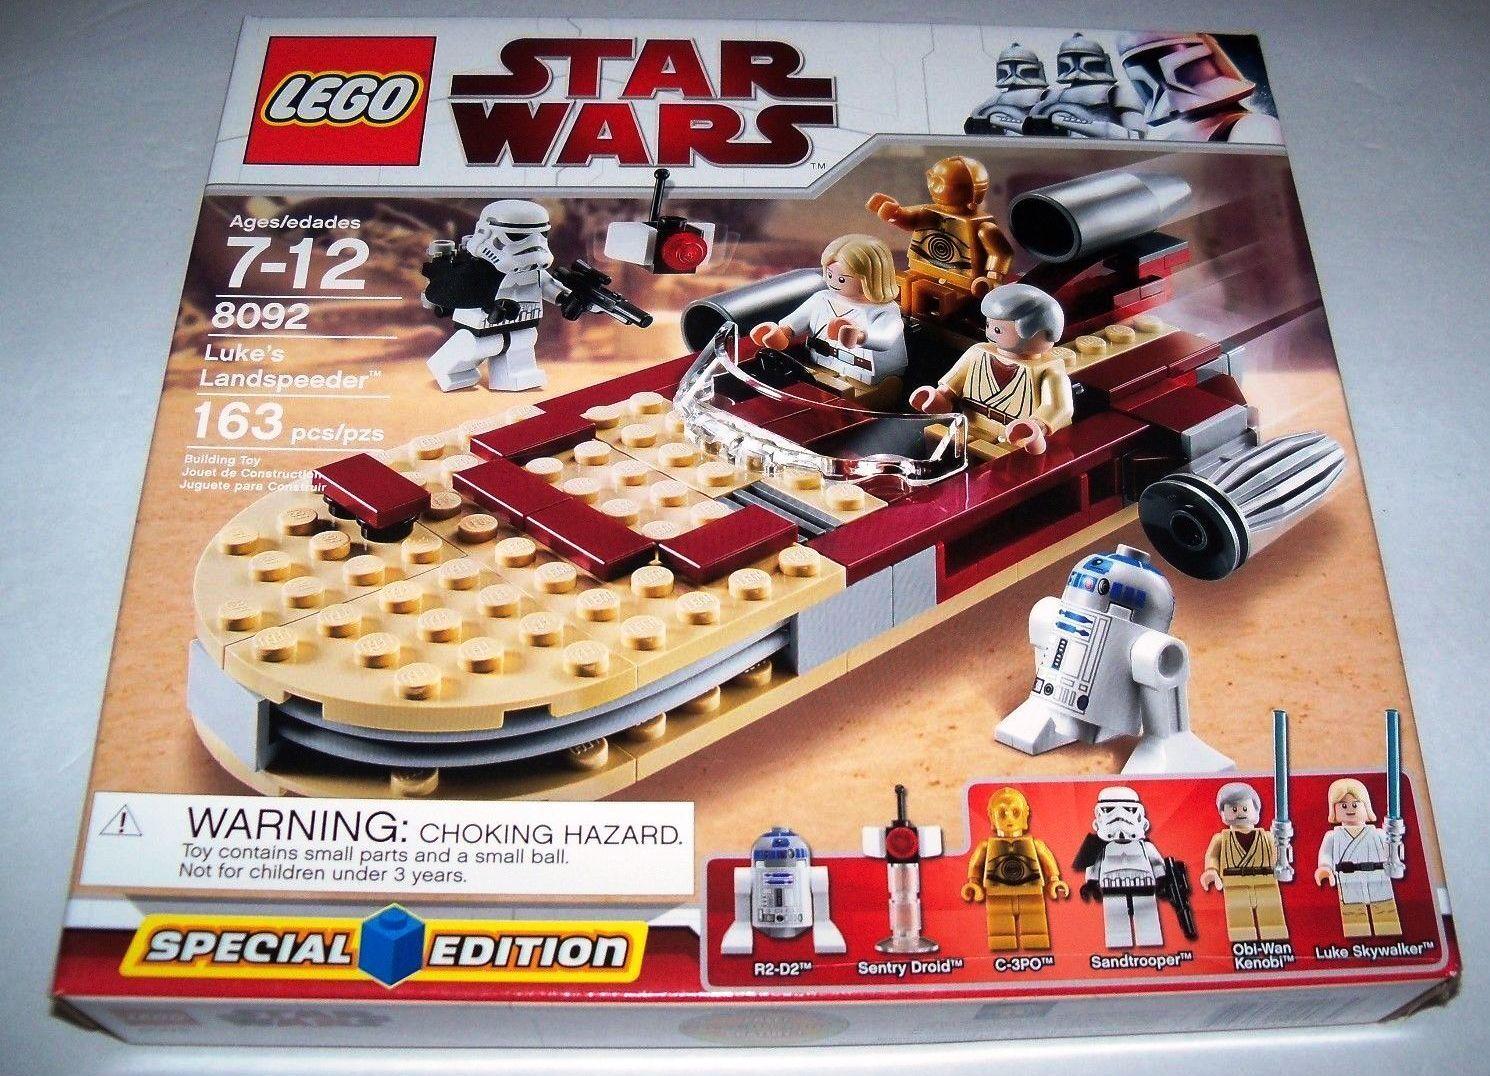 RETIROT Star Wars Lego 8092 LUKE'S LANDSPEEDER SPECIAL EDITION w/ BOX & INSTRUCT